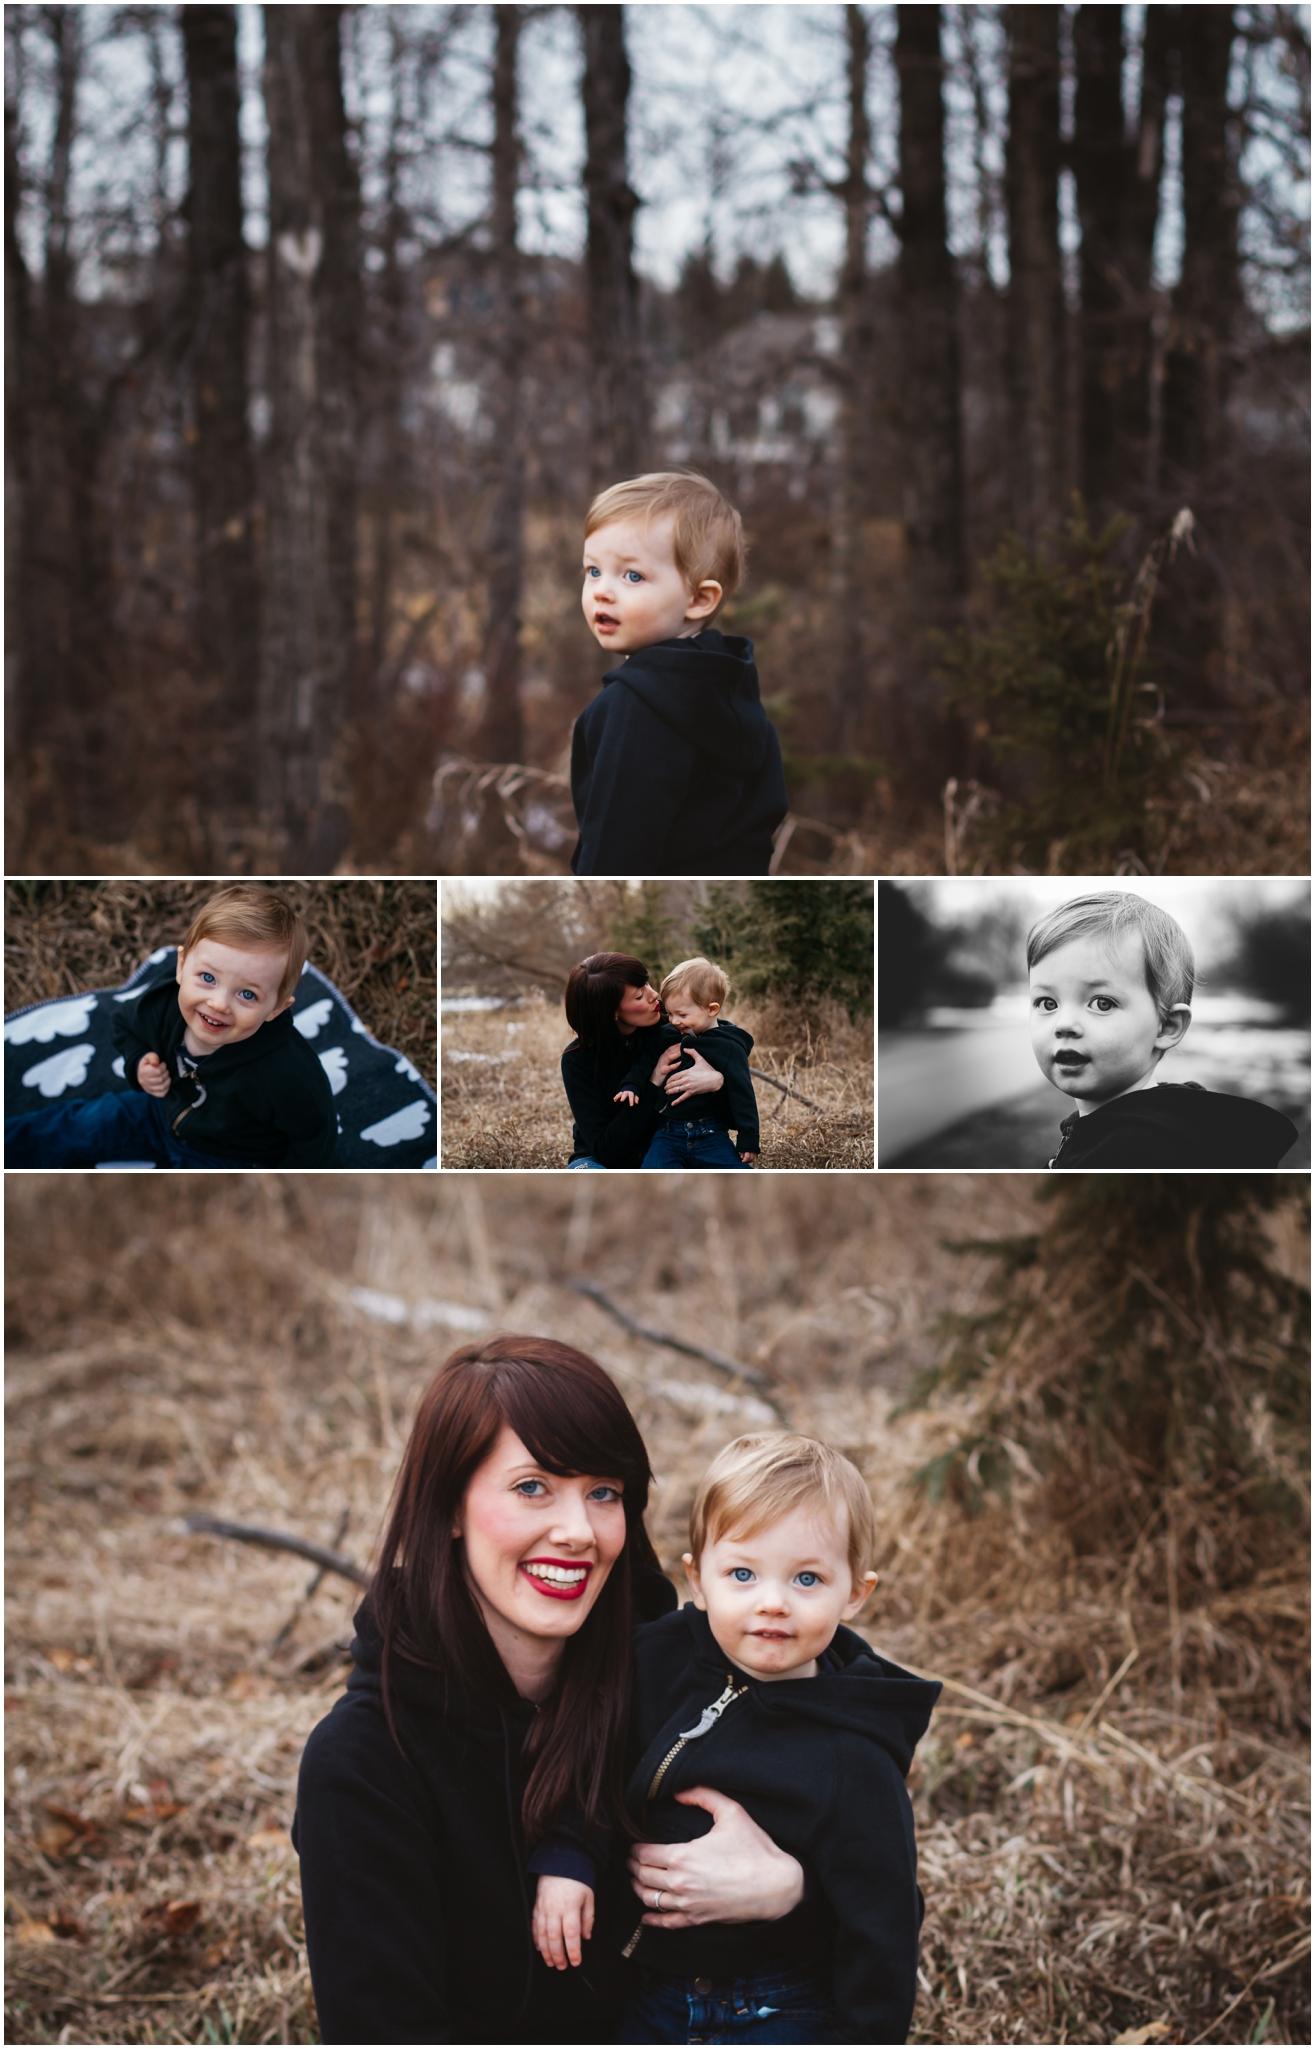 Edmonton family child photographer Best of 2016 March